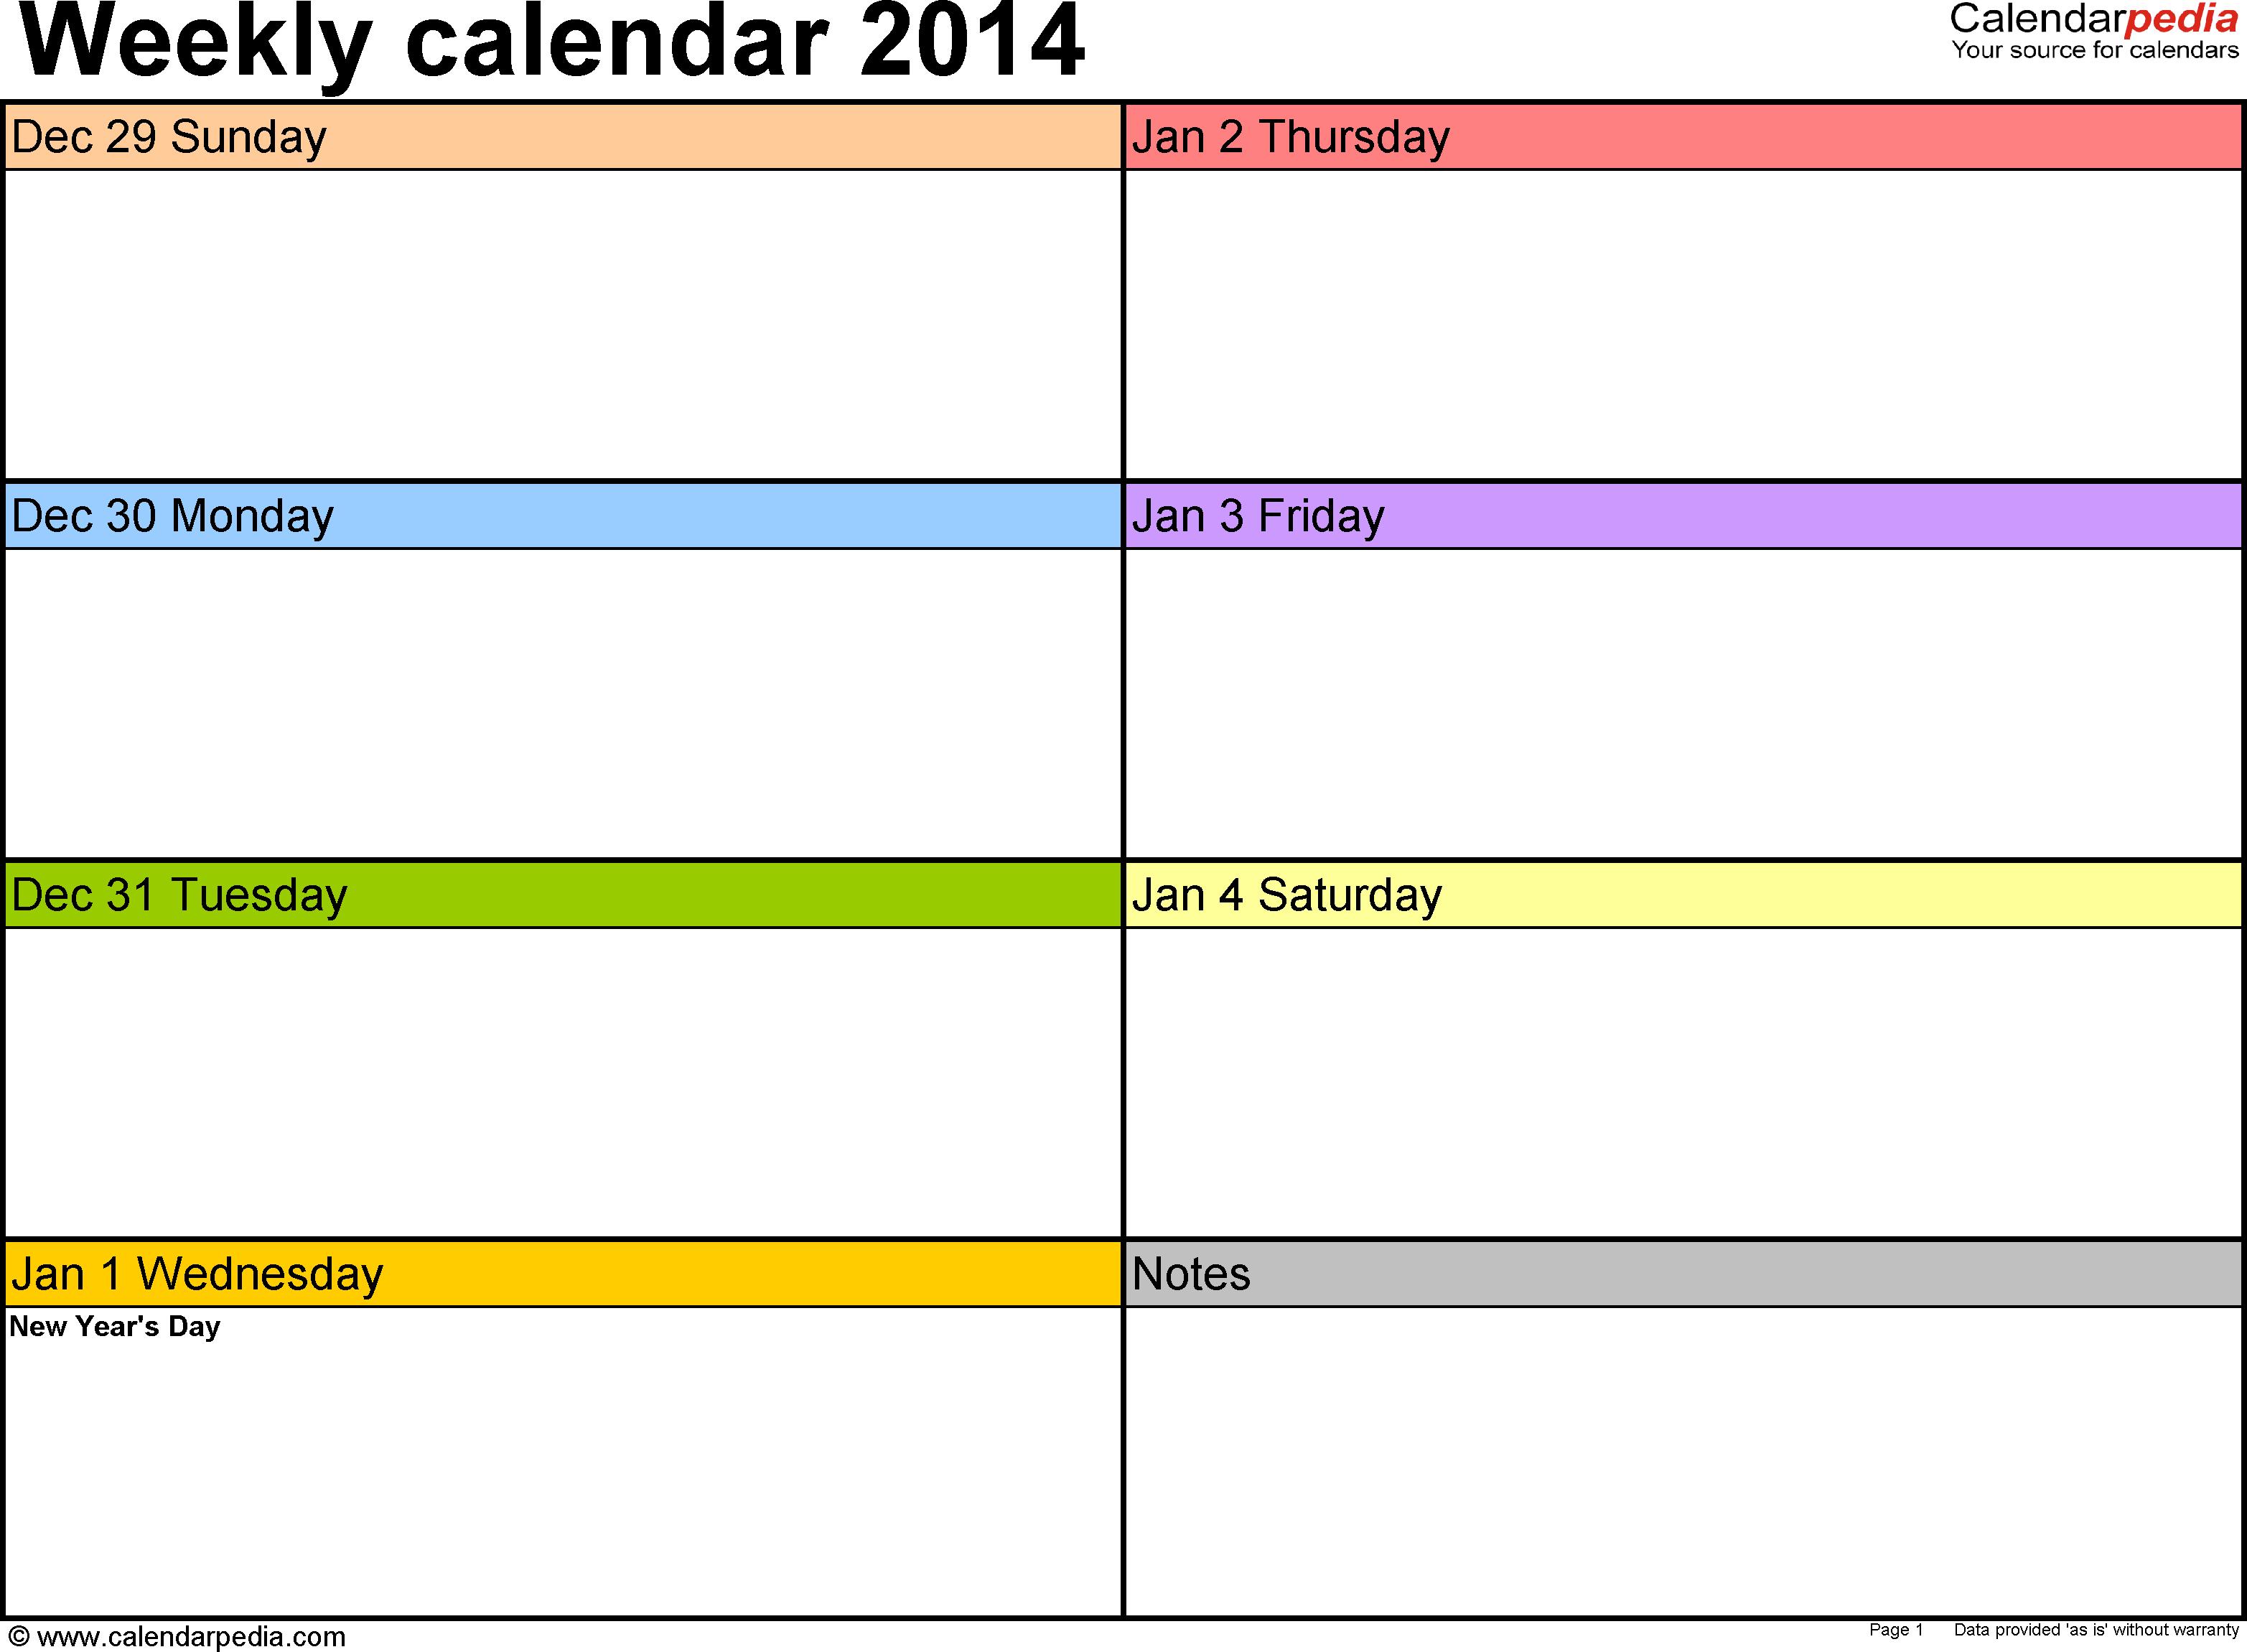 Alfa img - Showing > 2015 Weekly Printable Calendar